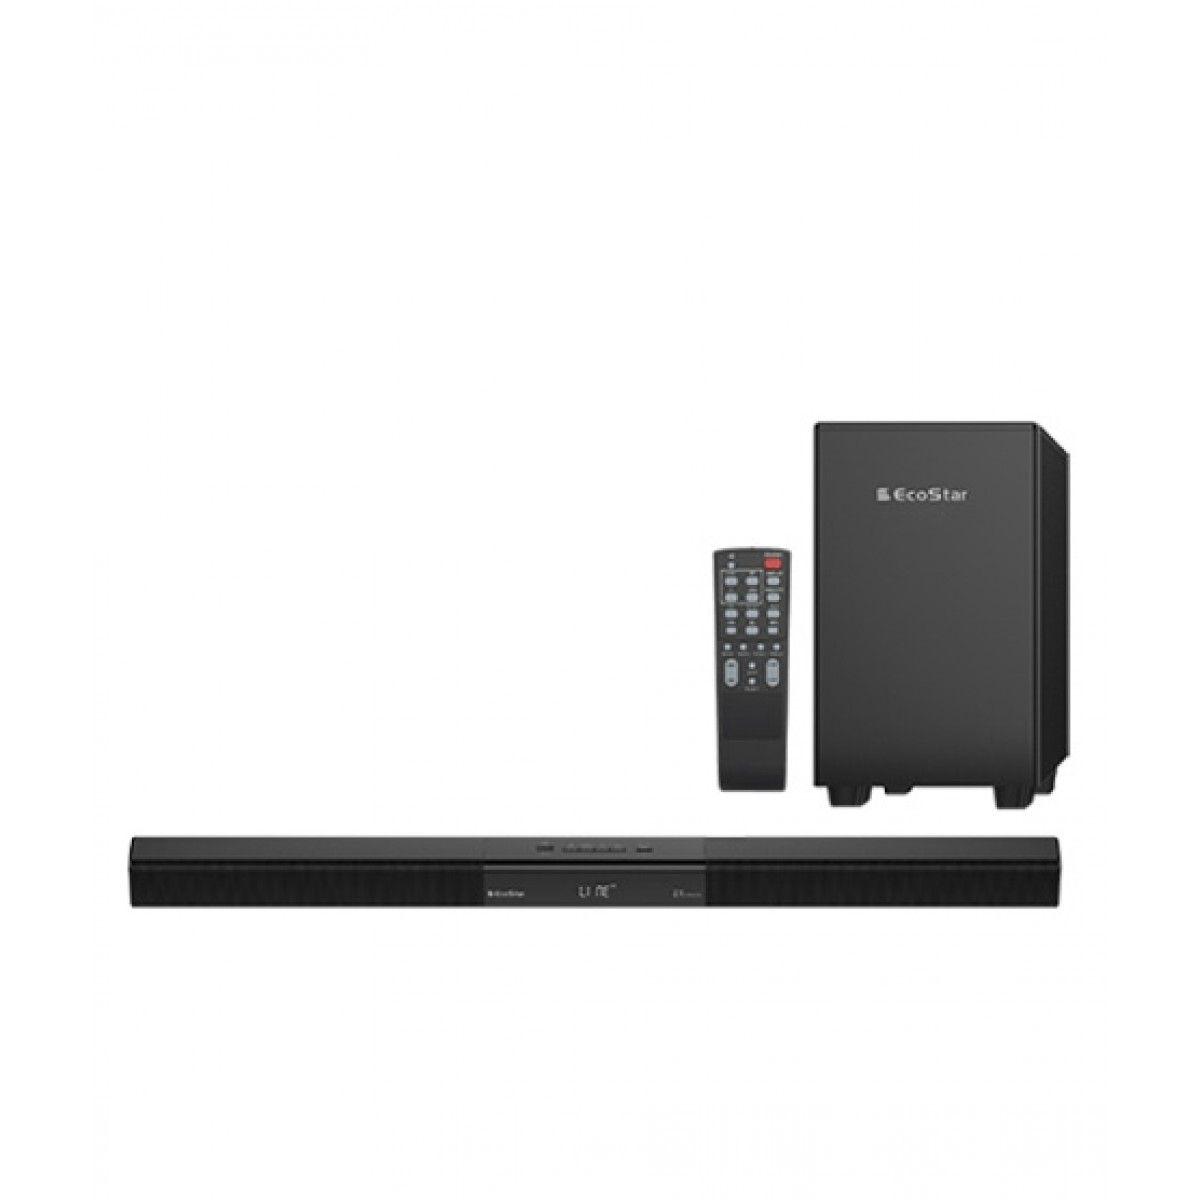 Ecostar (SB-D600) Soundbar